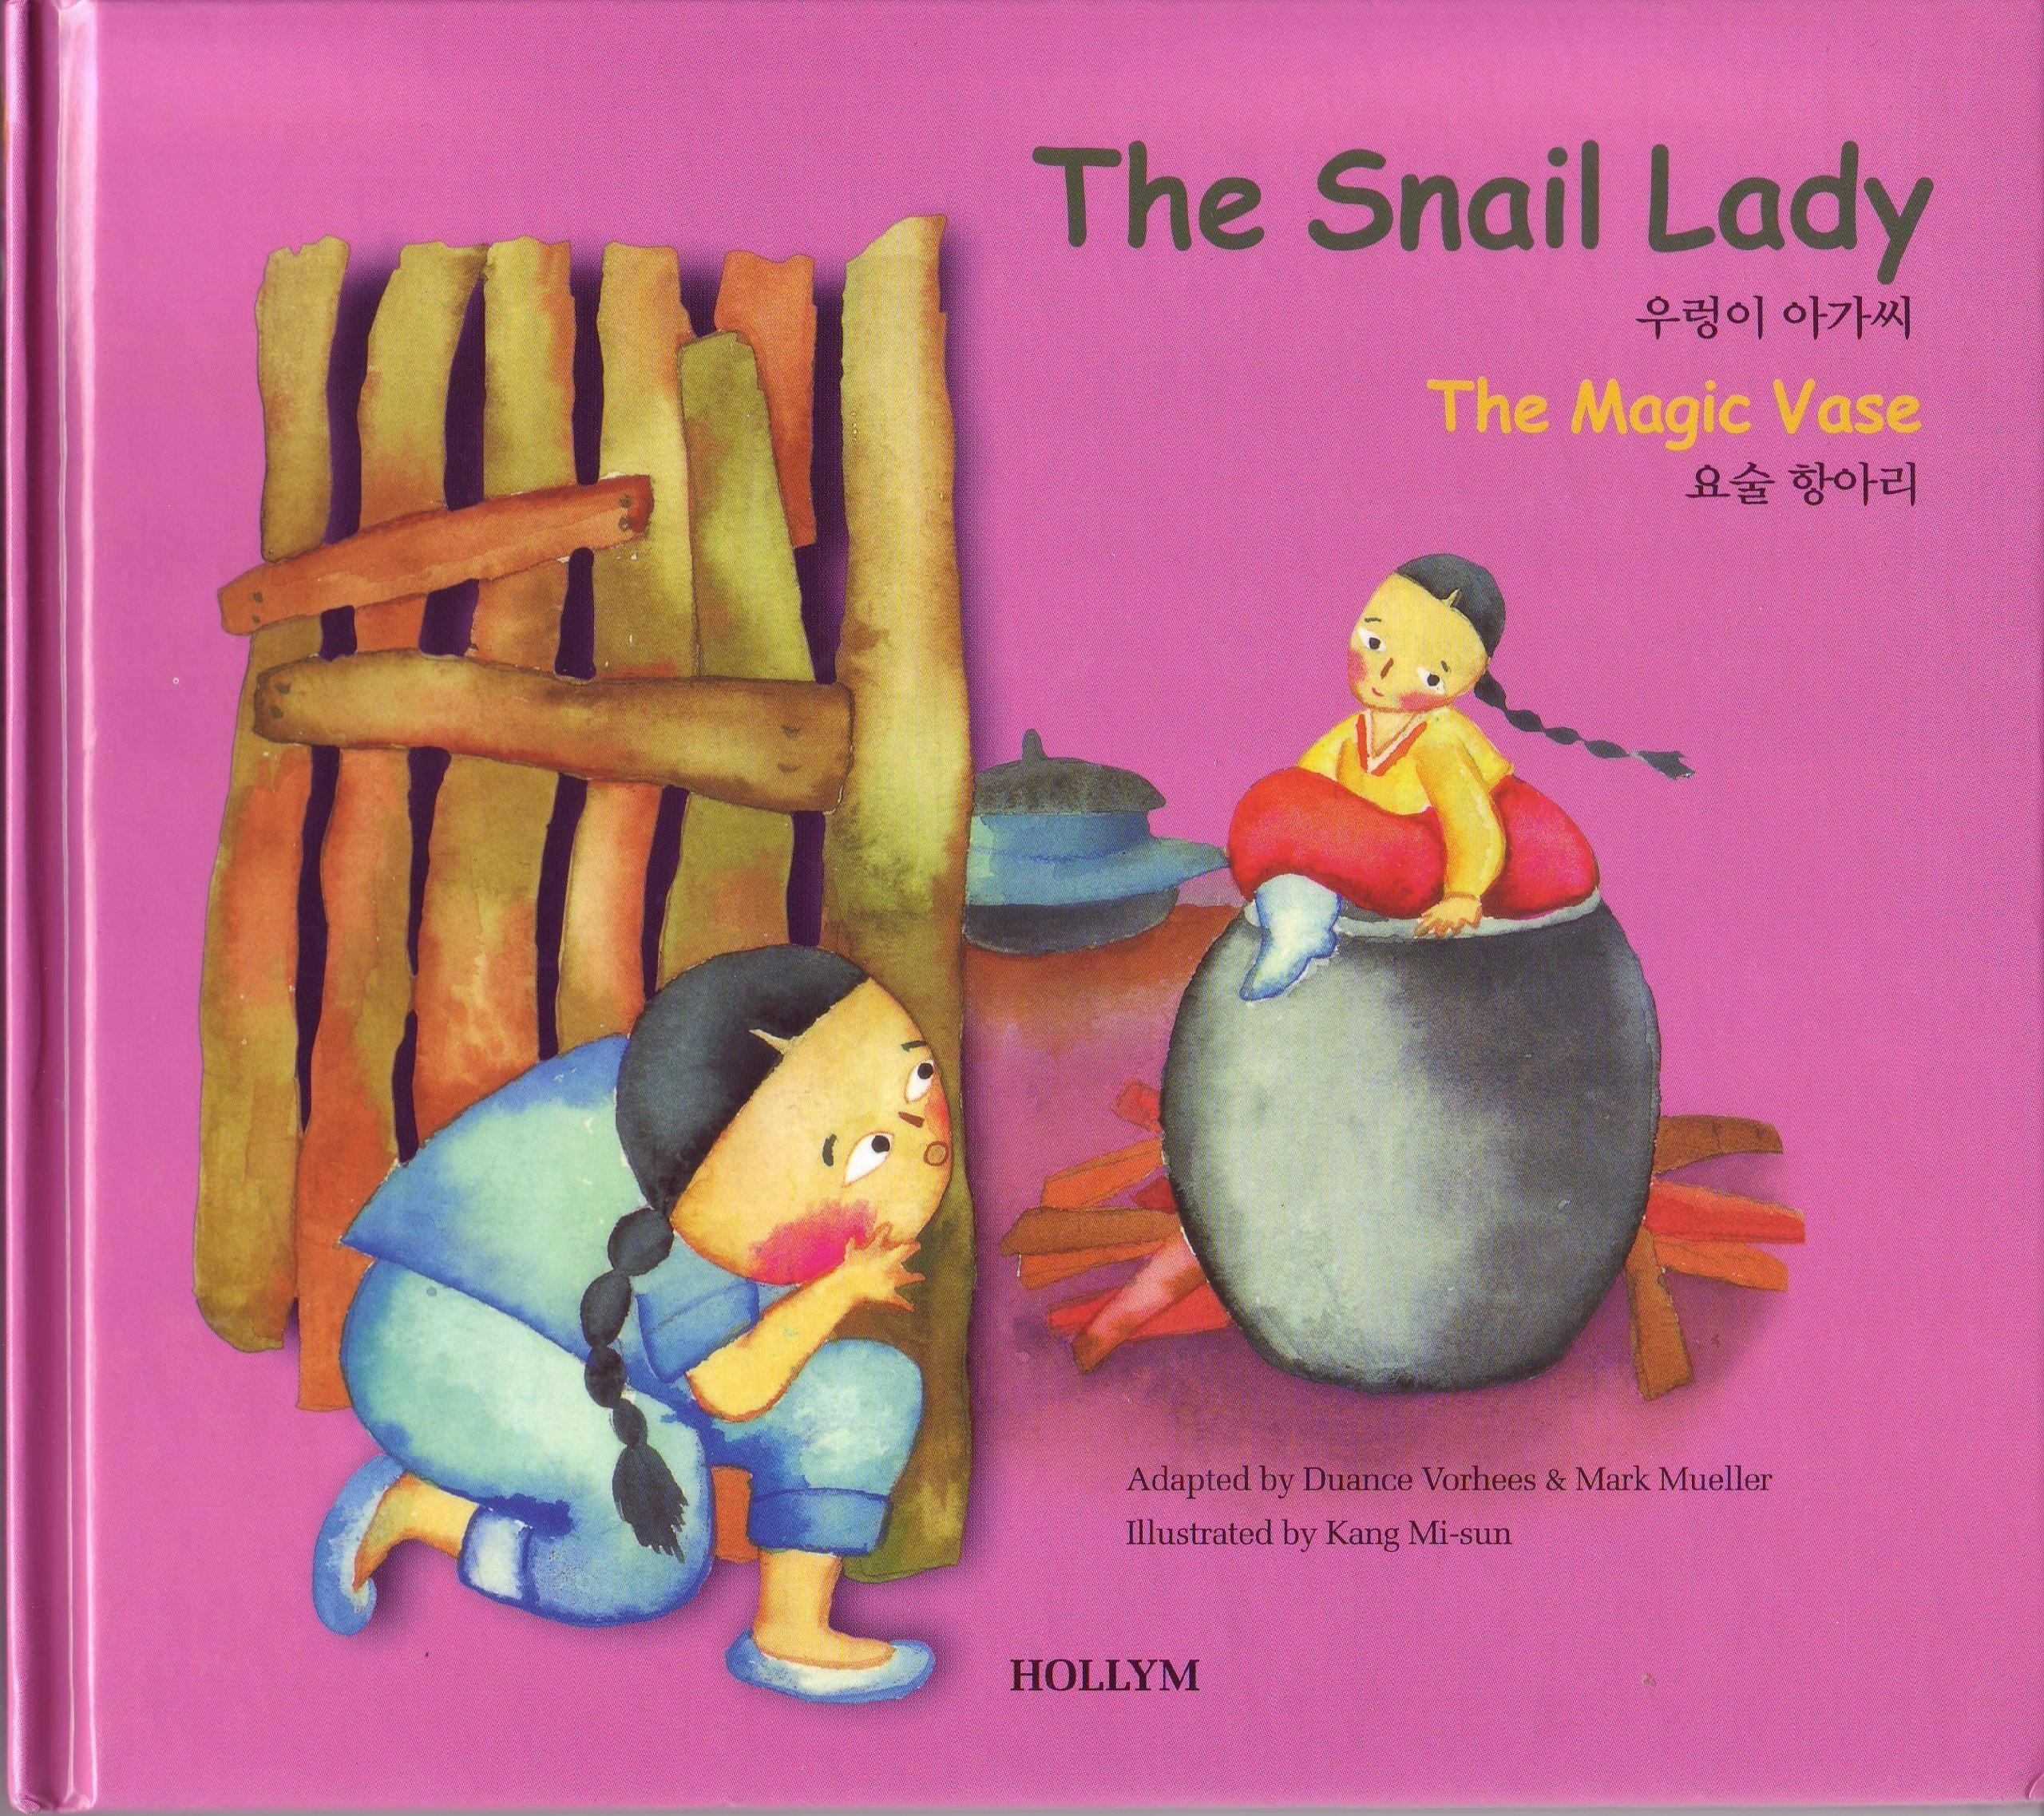 Download The Snail Lady/The Magic Vase (Korean Folk Tales for Children, Vol 6) (Korean Folk Tales for Children, Vol 6) (Korean Folk Tales for Children, Vol 6) pdf epub